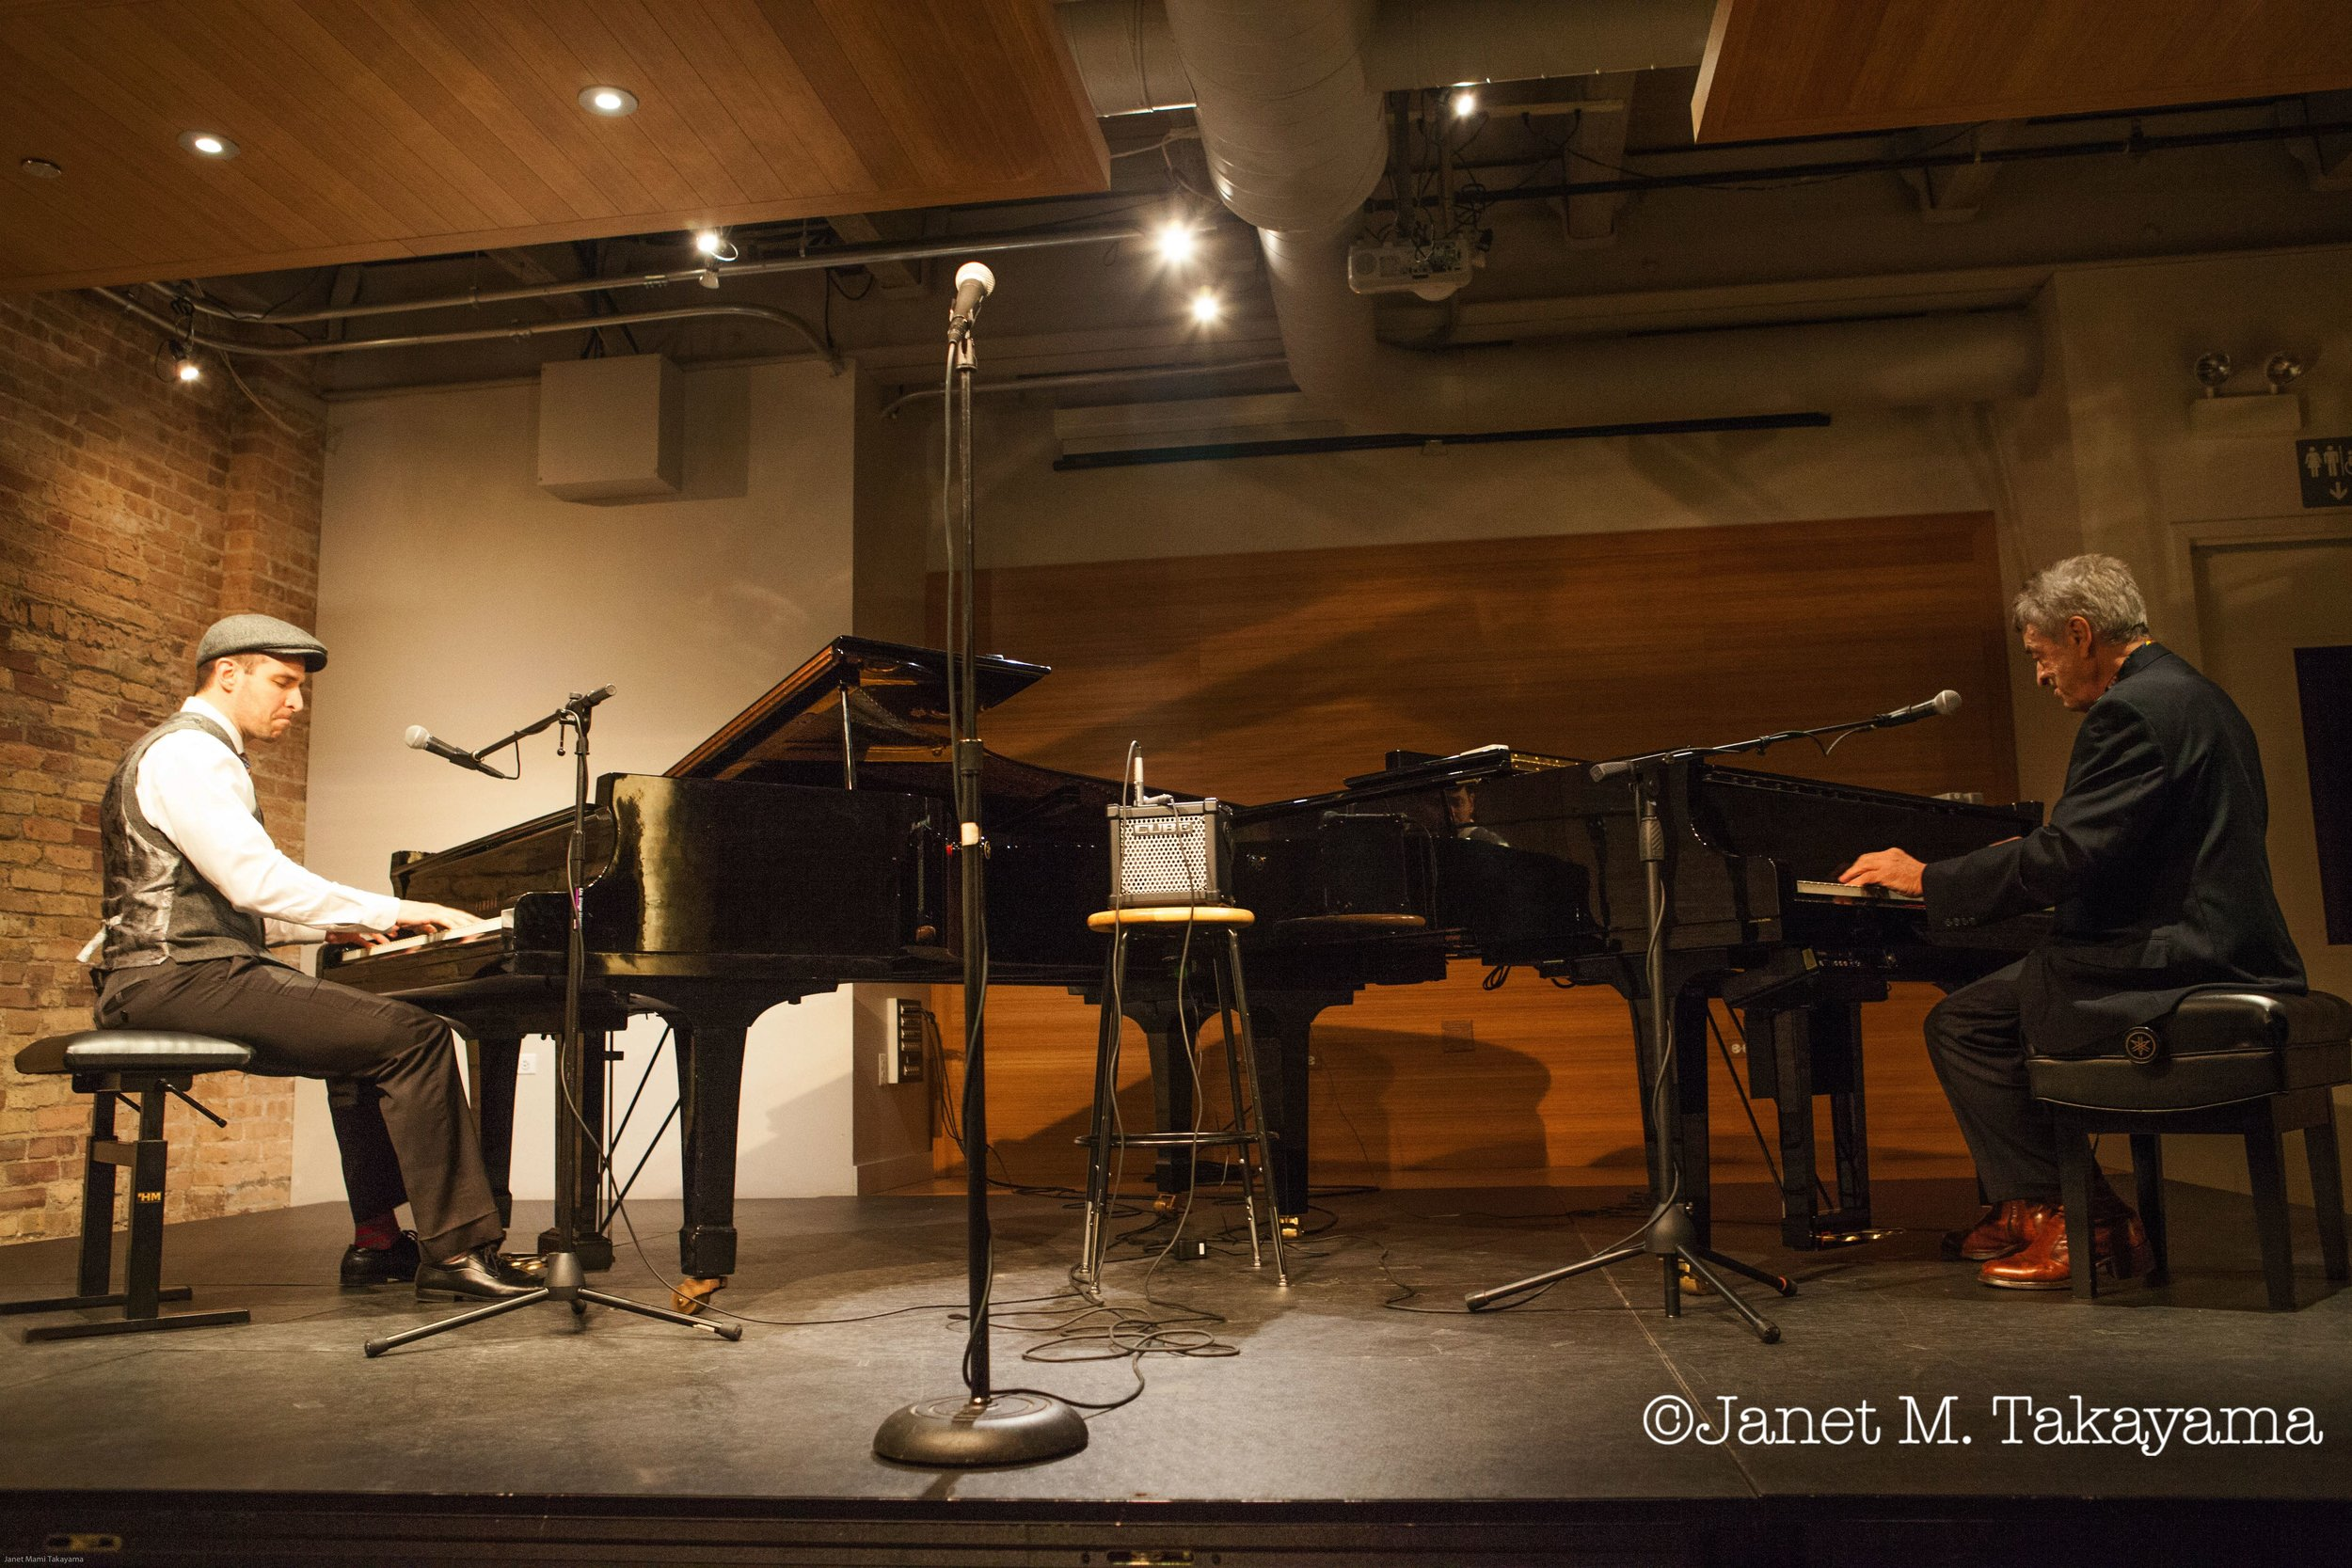 pianoforte6.jpg